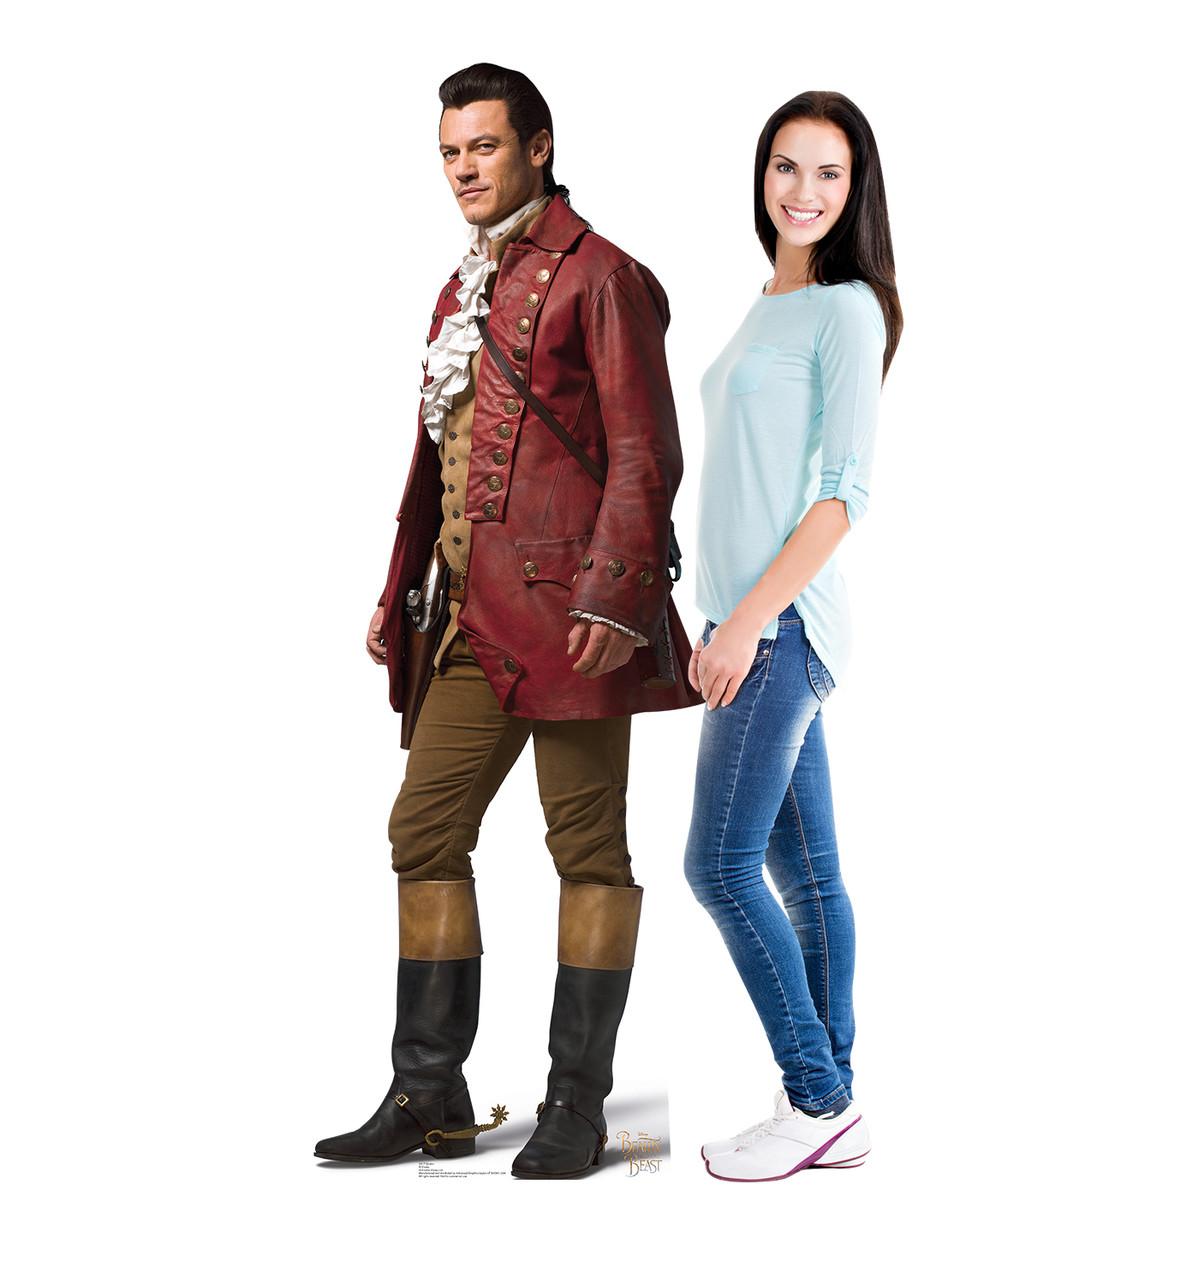 Life-size Gaston (Disney's Beauty and the Beast) Cardboard Standup | Cardboard Cutout 2